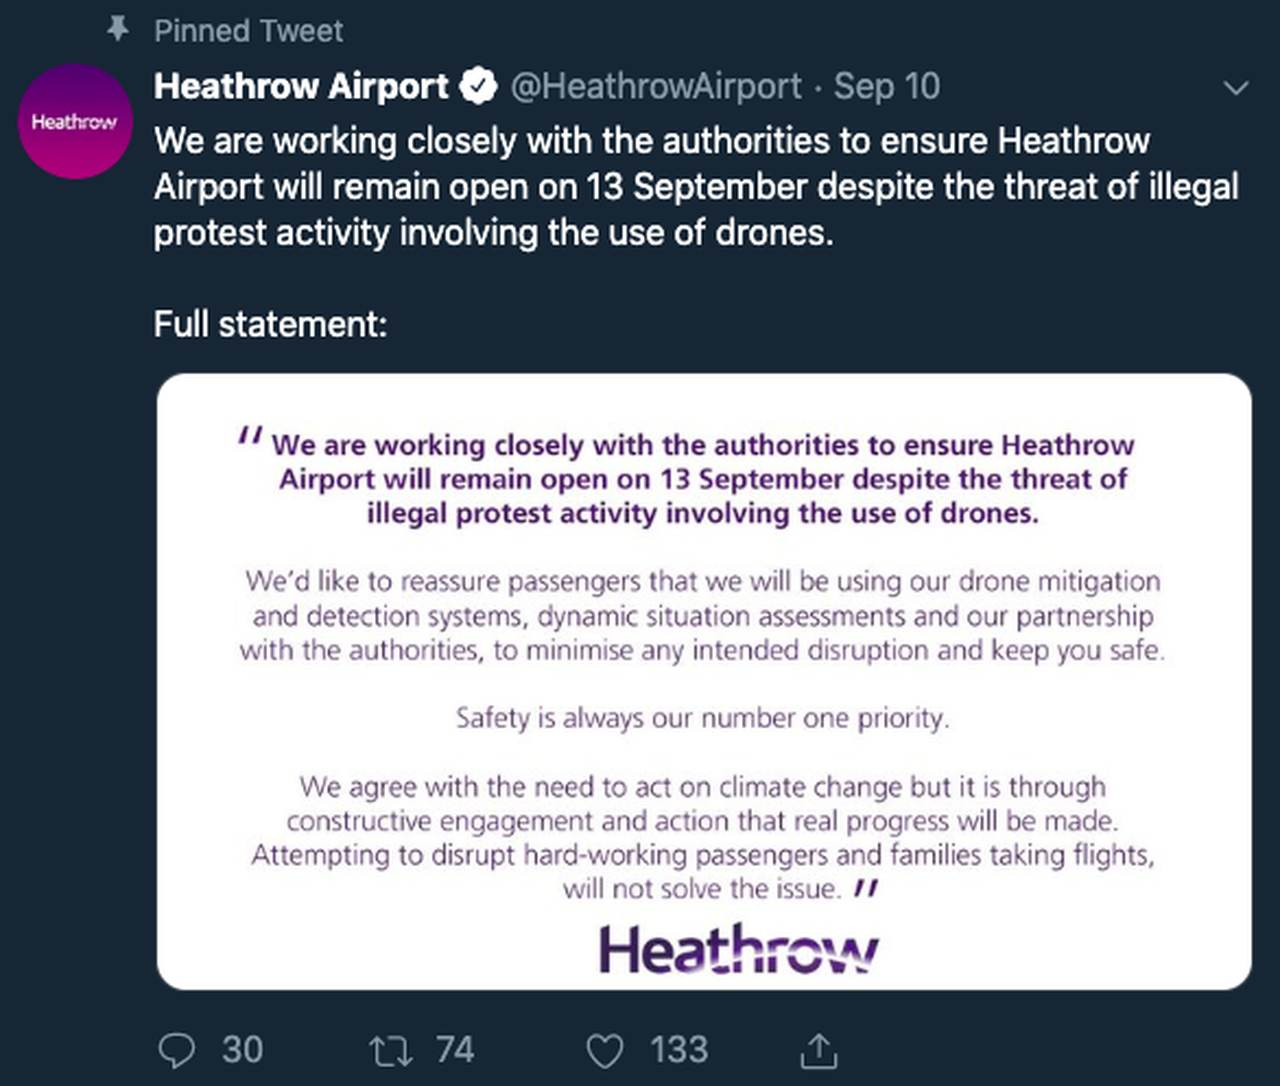 Tweet from Heathrow airport